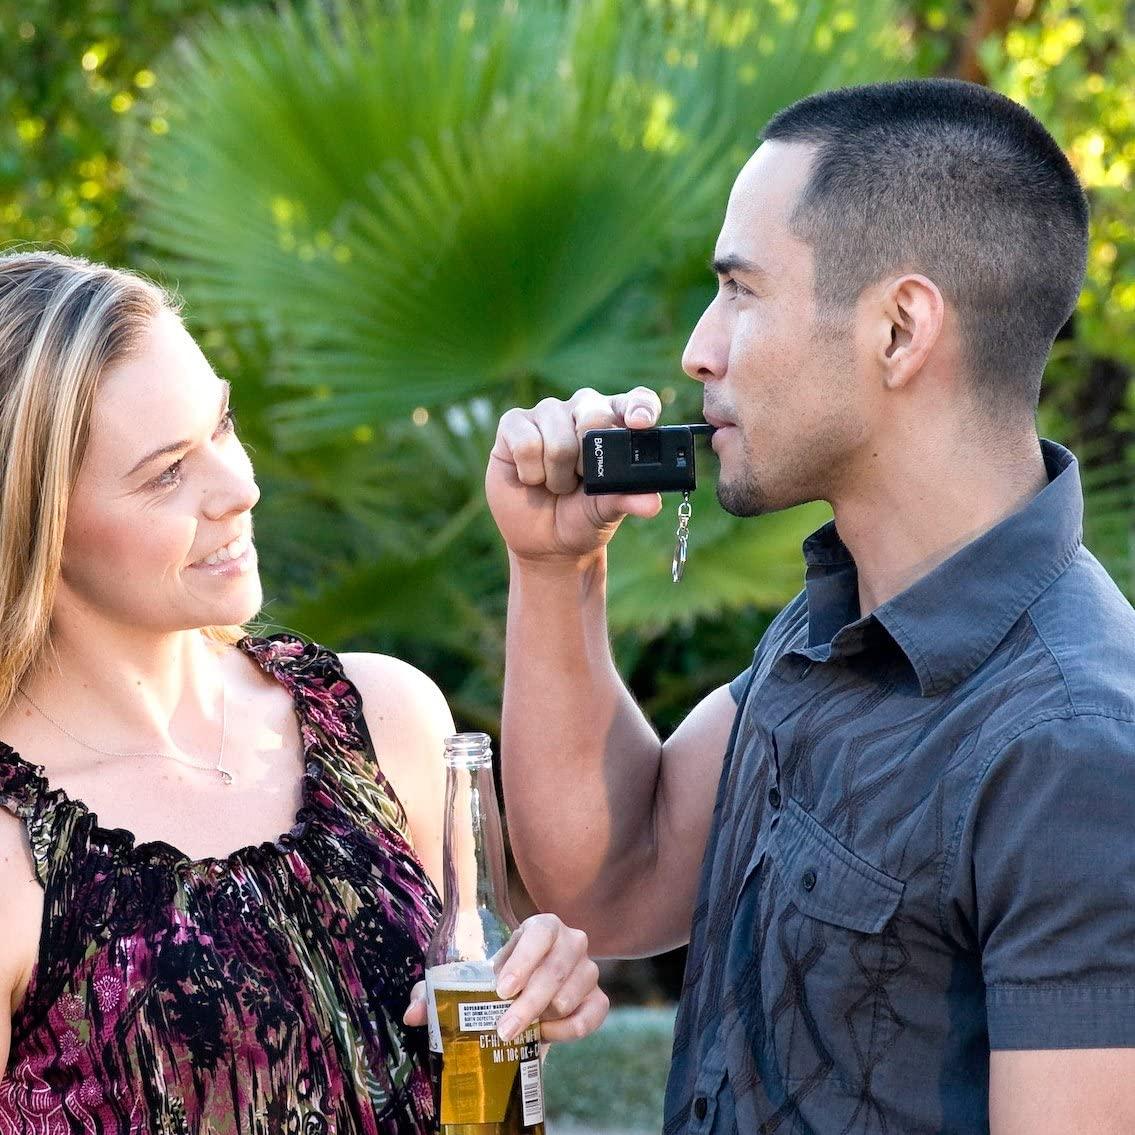 Alcohol Tester Pocket Portable Breathalyzer